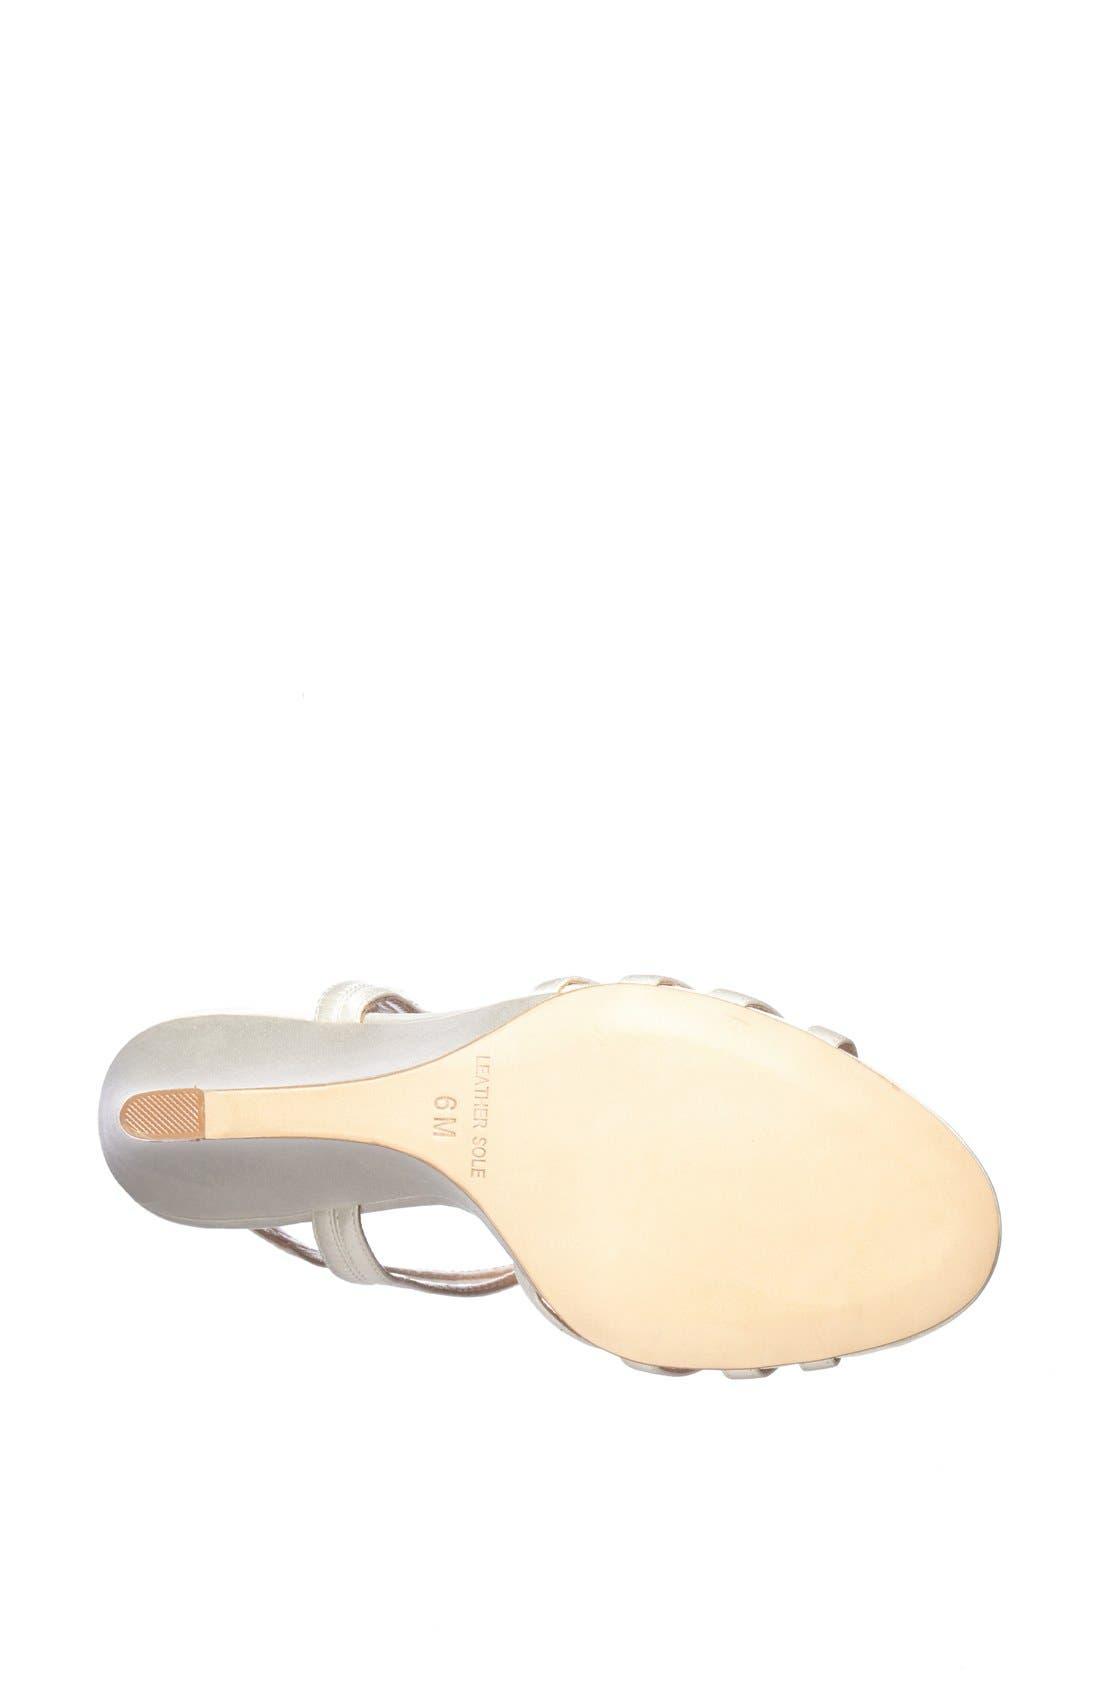 Alternate Image 3  - Badgley Mischka 'Kole' T-Strap Wedge Sandal